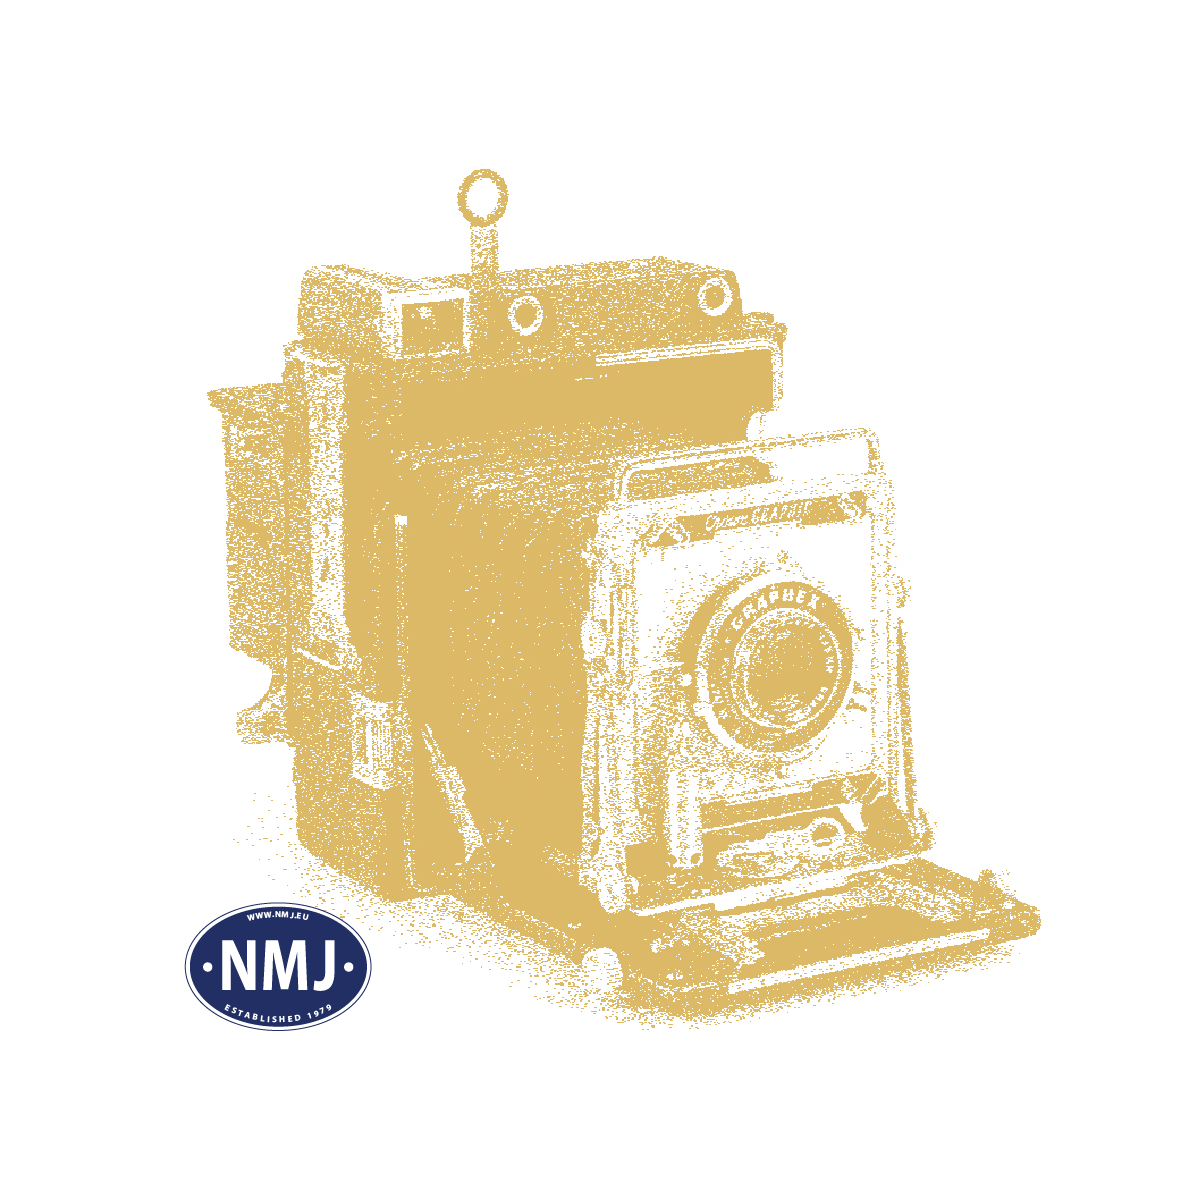 ZIMMX600P12 - MX600P12 Digitaldekoder, Plux 12, DCC / MM, 25 x 11 x 2 mm, 4 Funksjonsutganger, Railcom